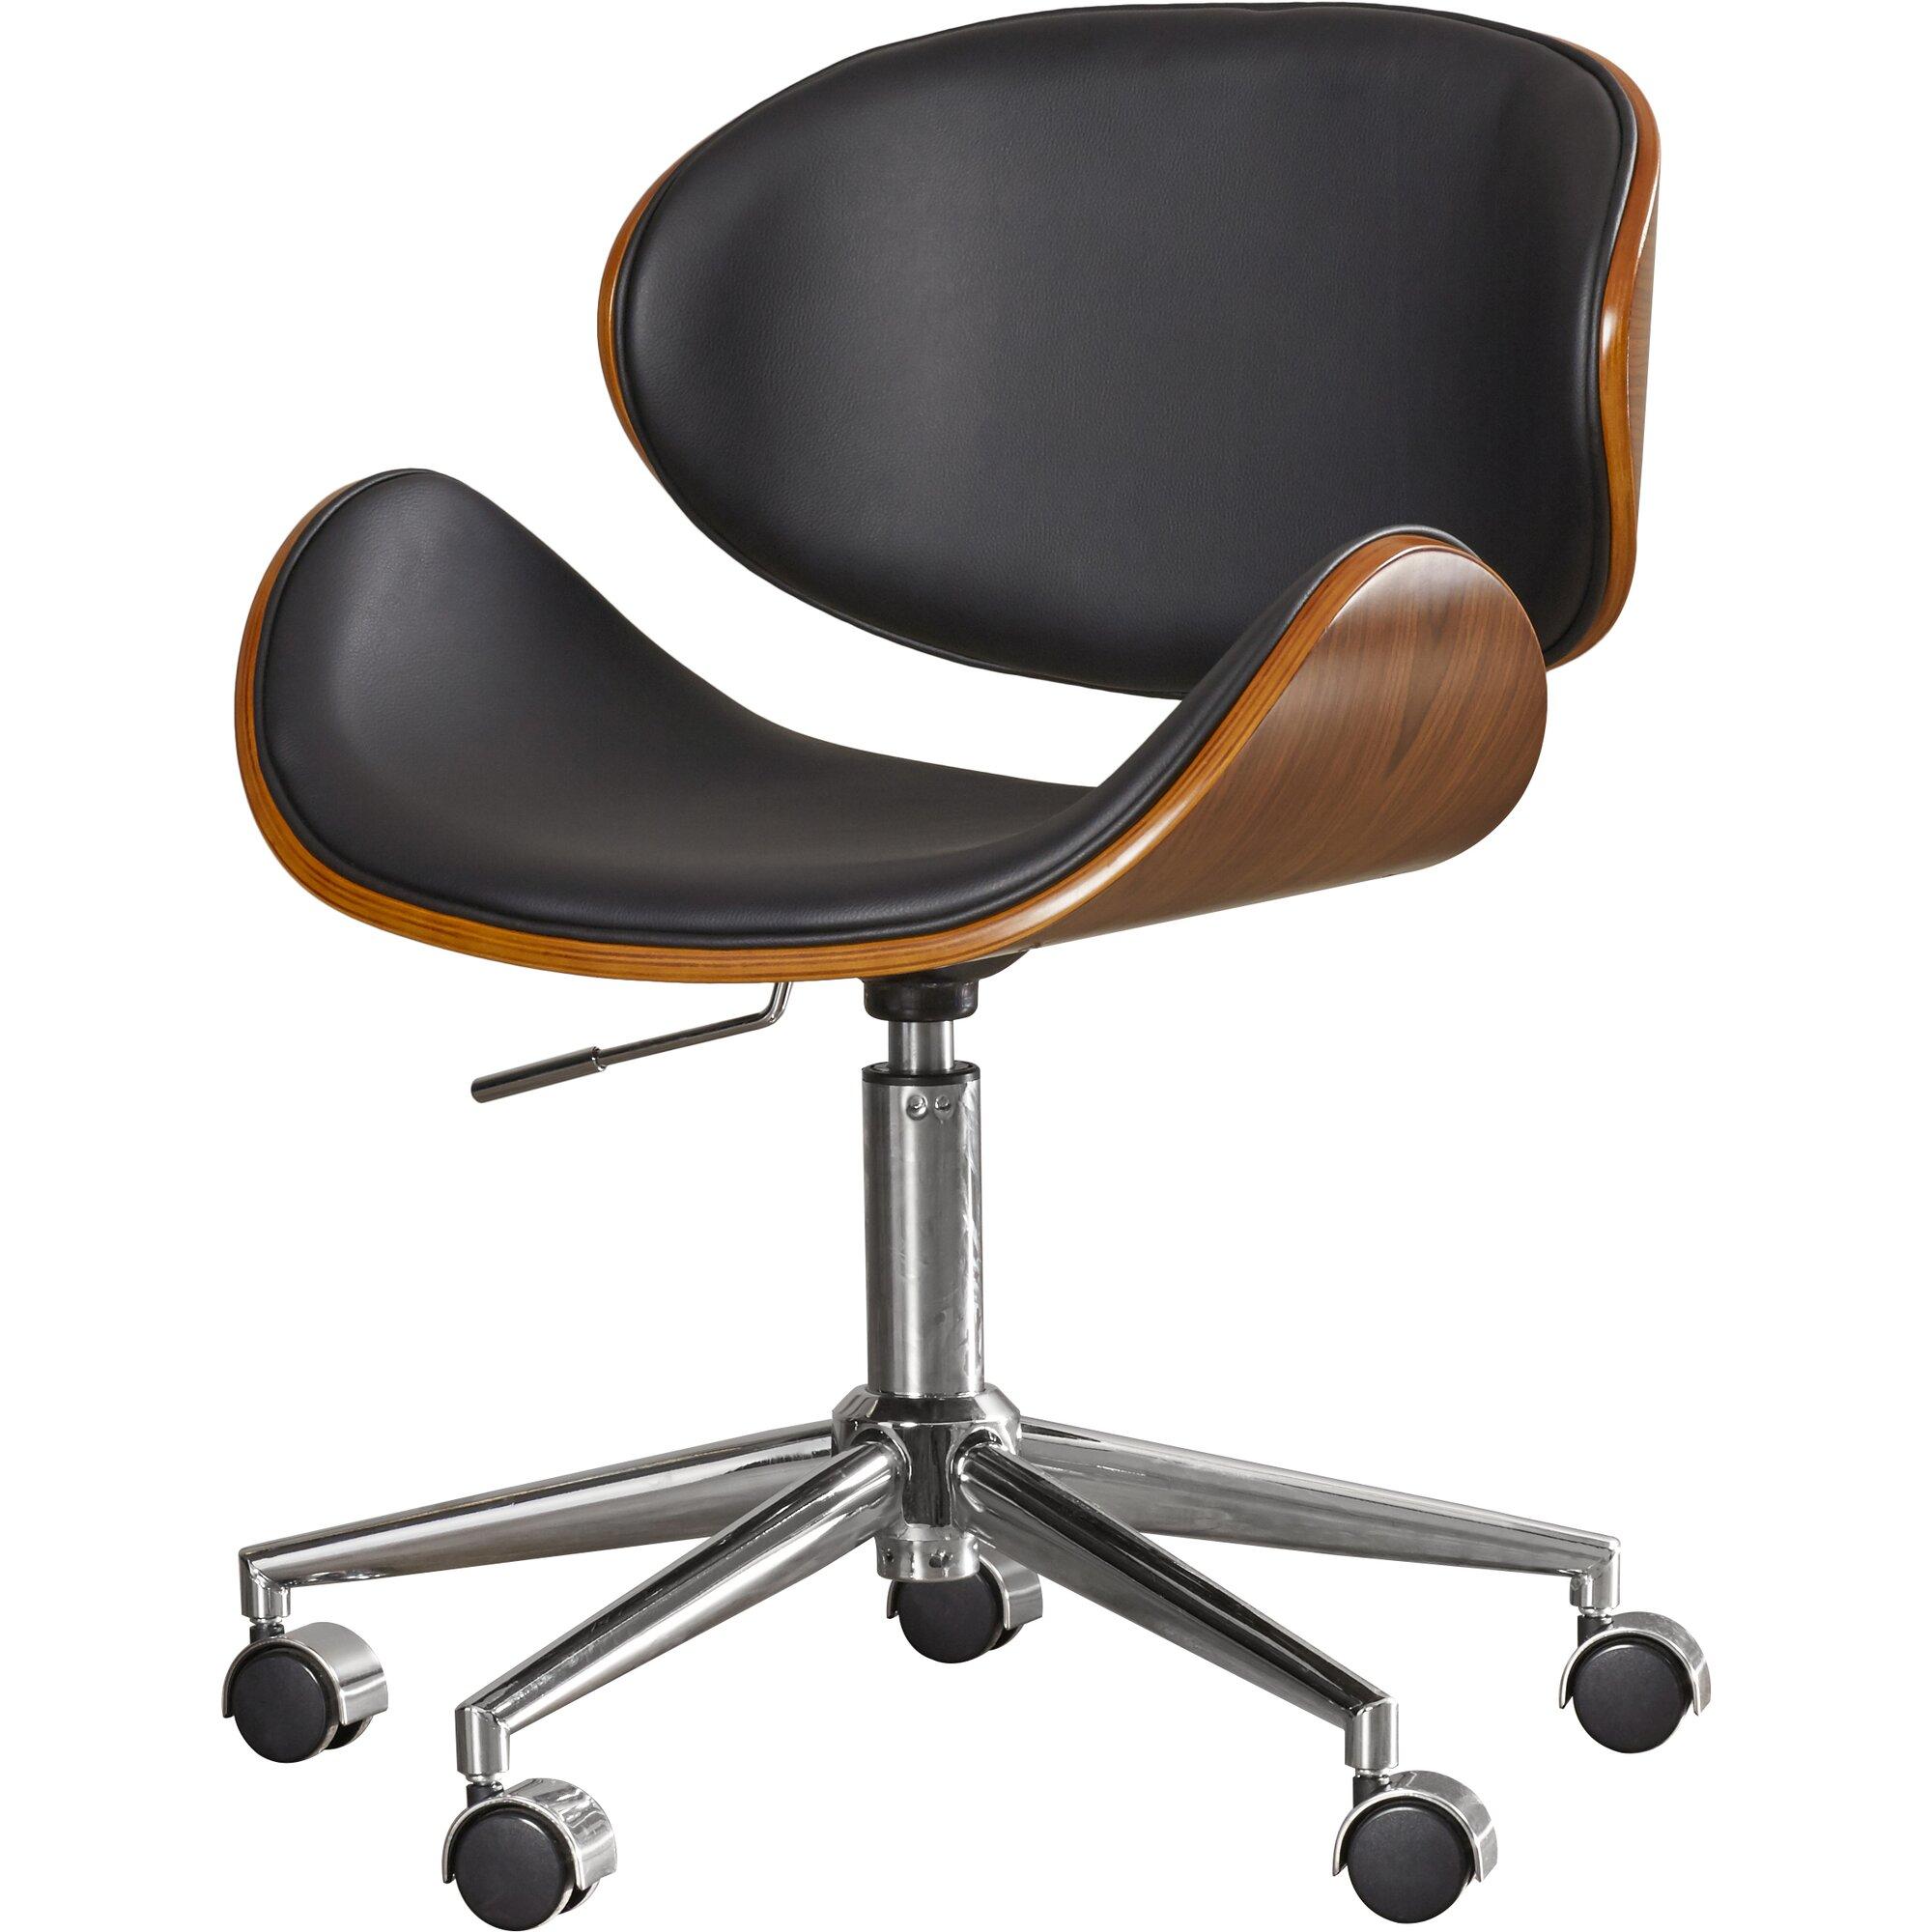 Modern leather office chair - Urban Unity Quinn Mid Back Leather Office Chair